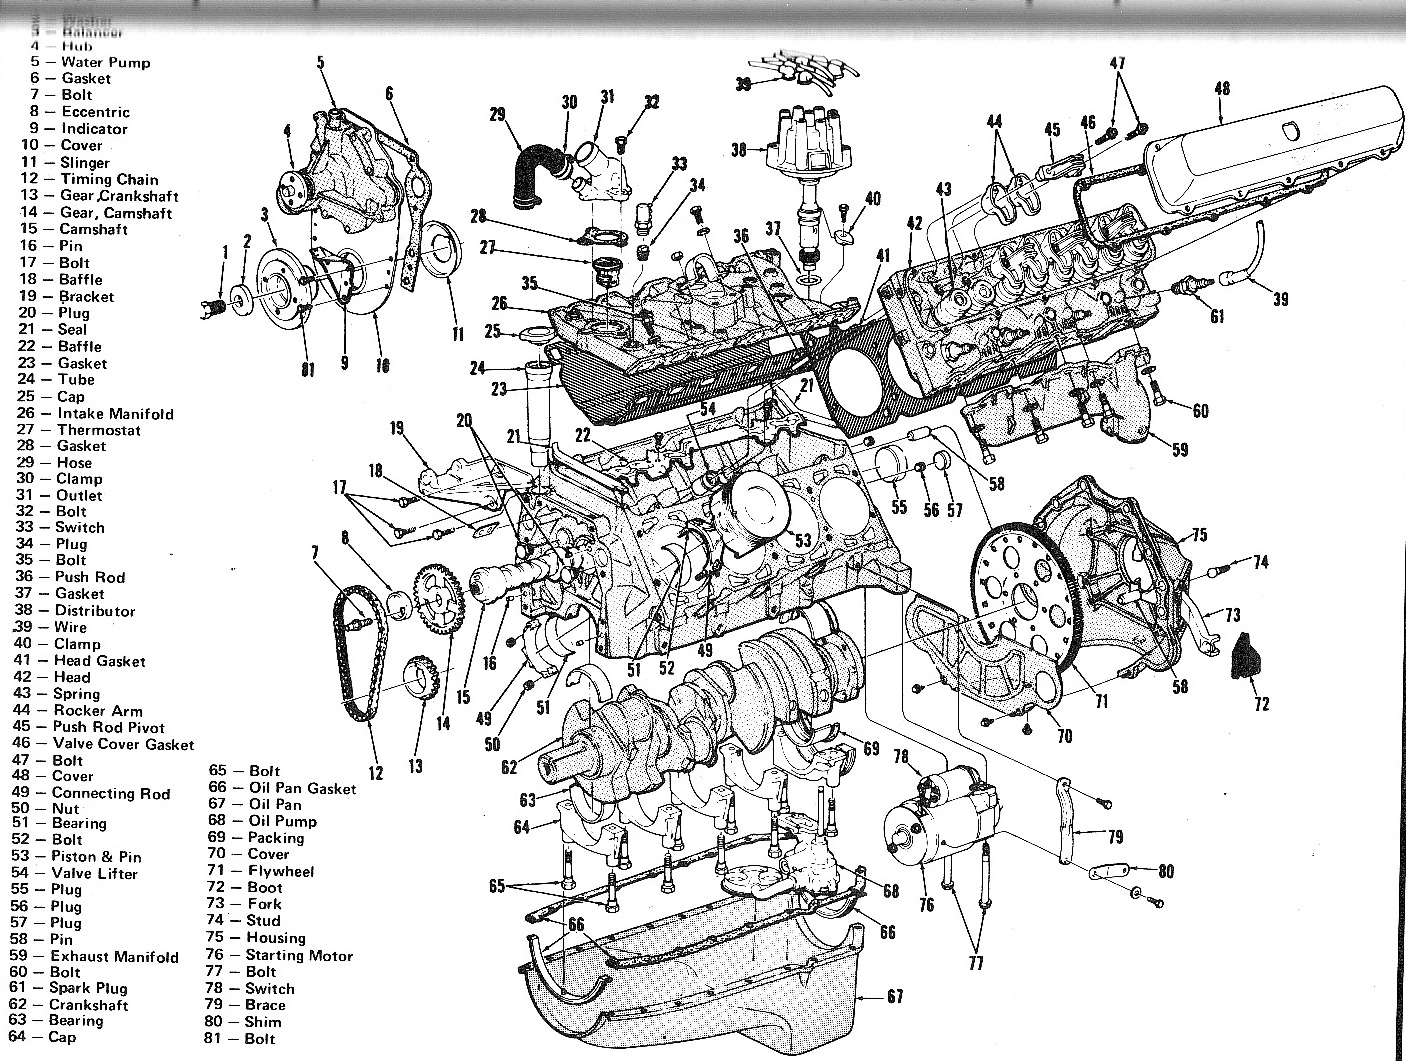 hight resolution of oldsmobile bravada parts manual jpg 1406x1061 2002 oldsmobile bravada parts manual